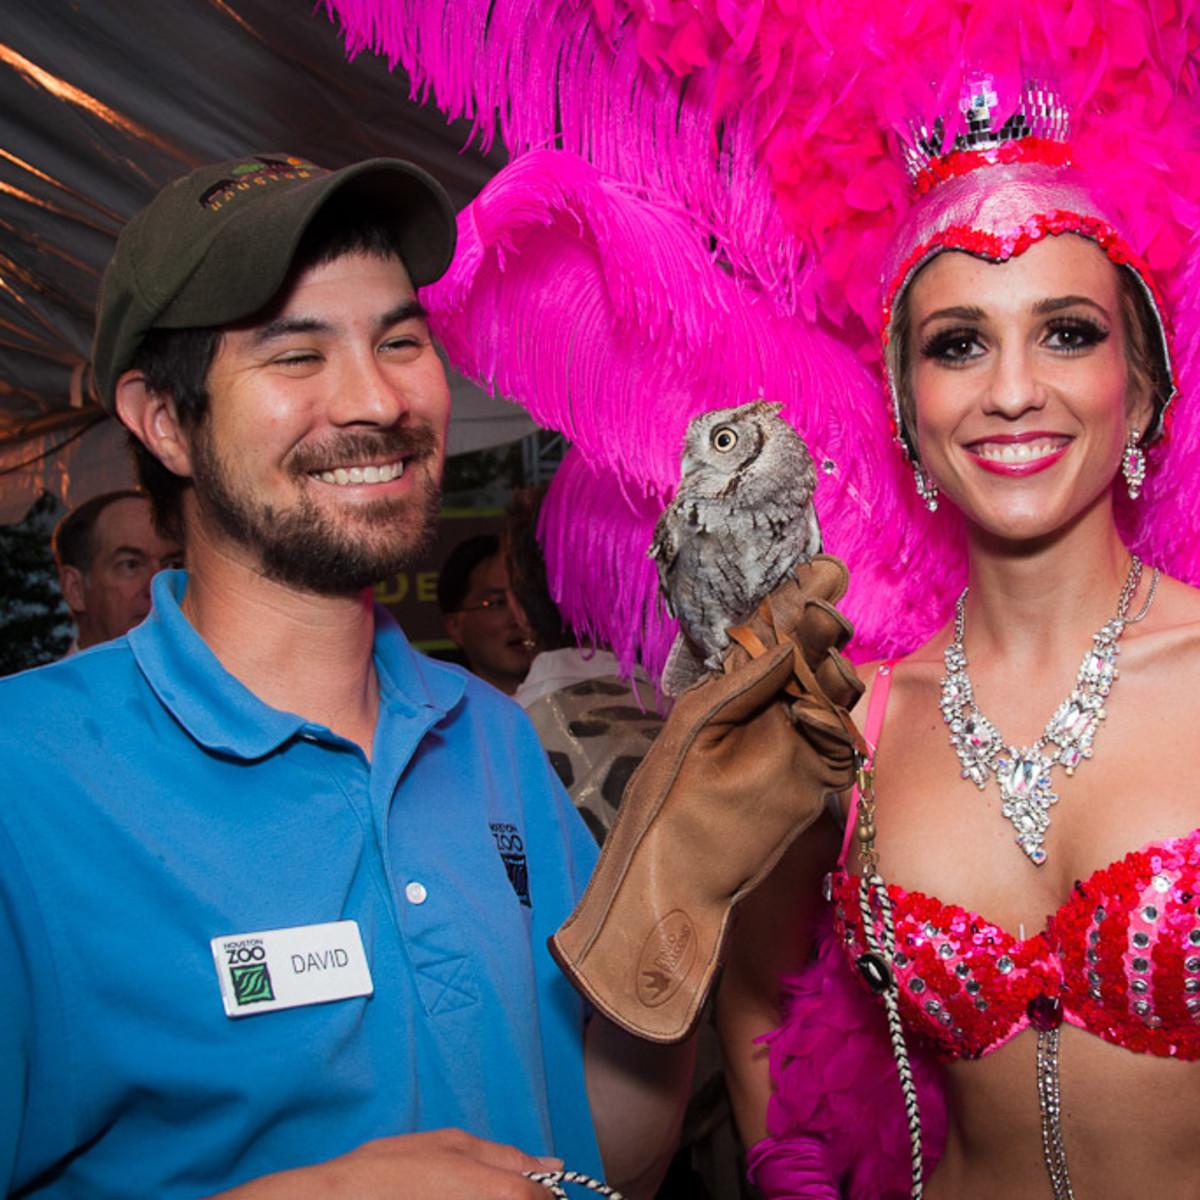 News_Houston Zoo Ball_April 2012_Screech Owl_Showgirl